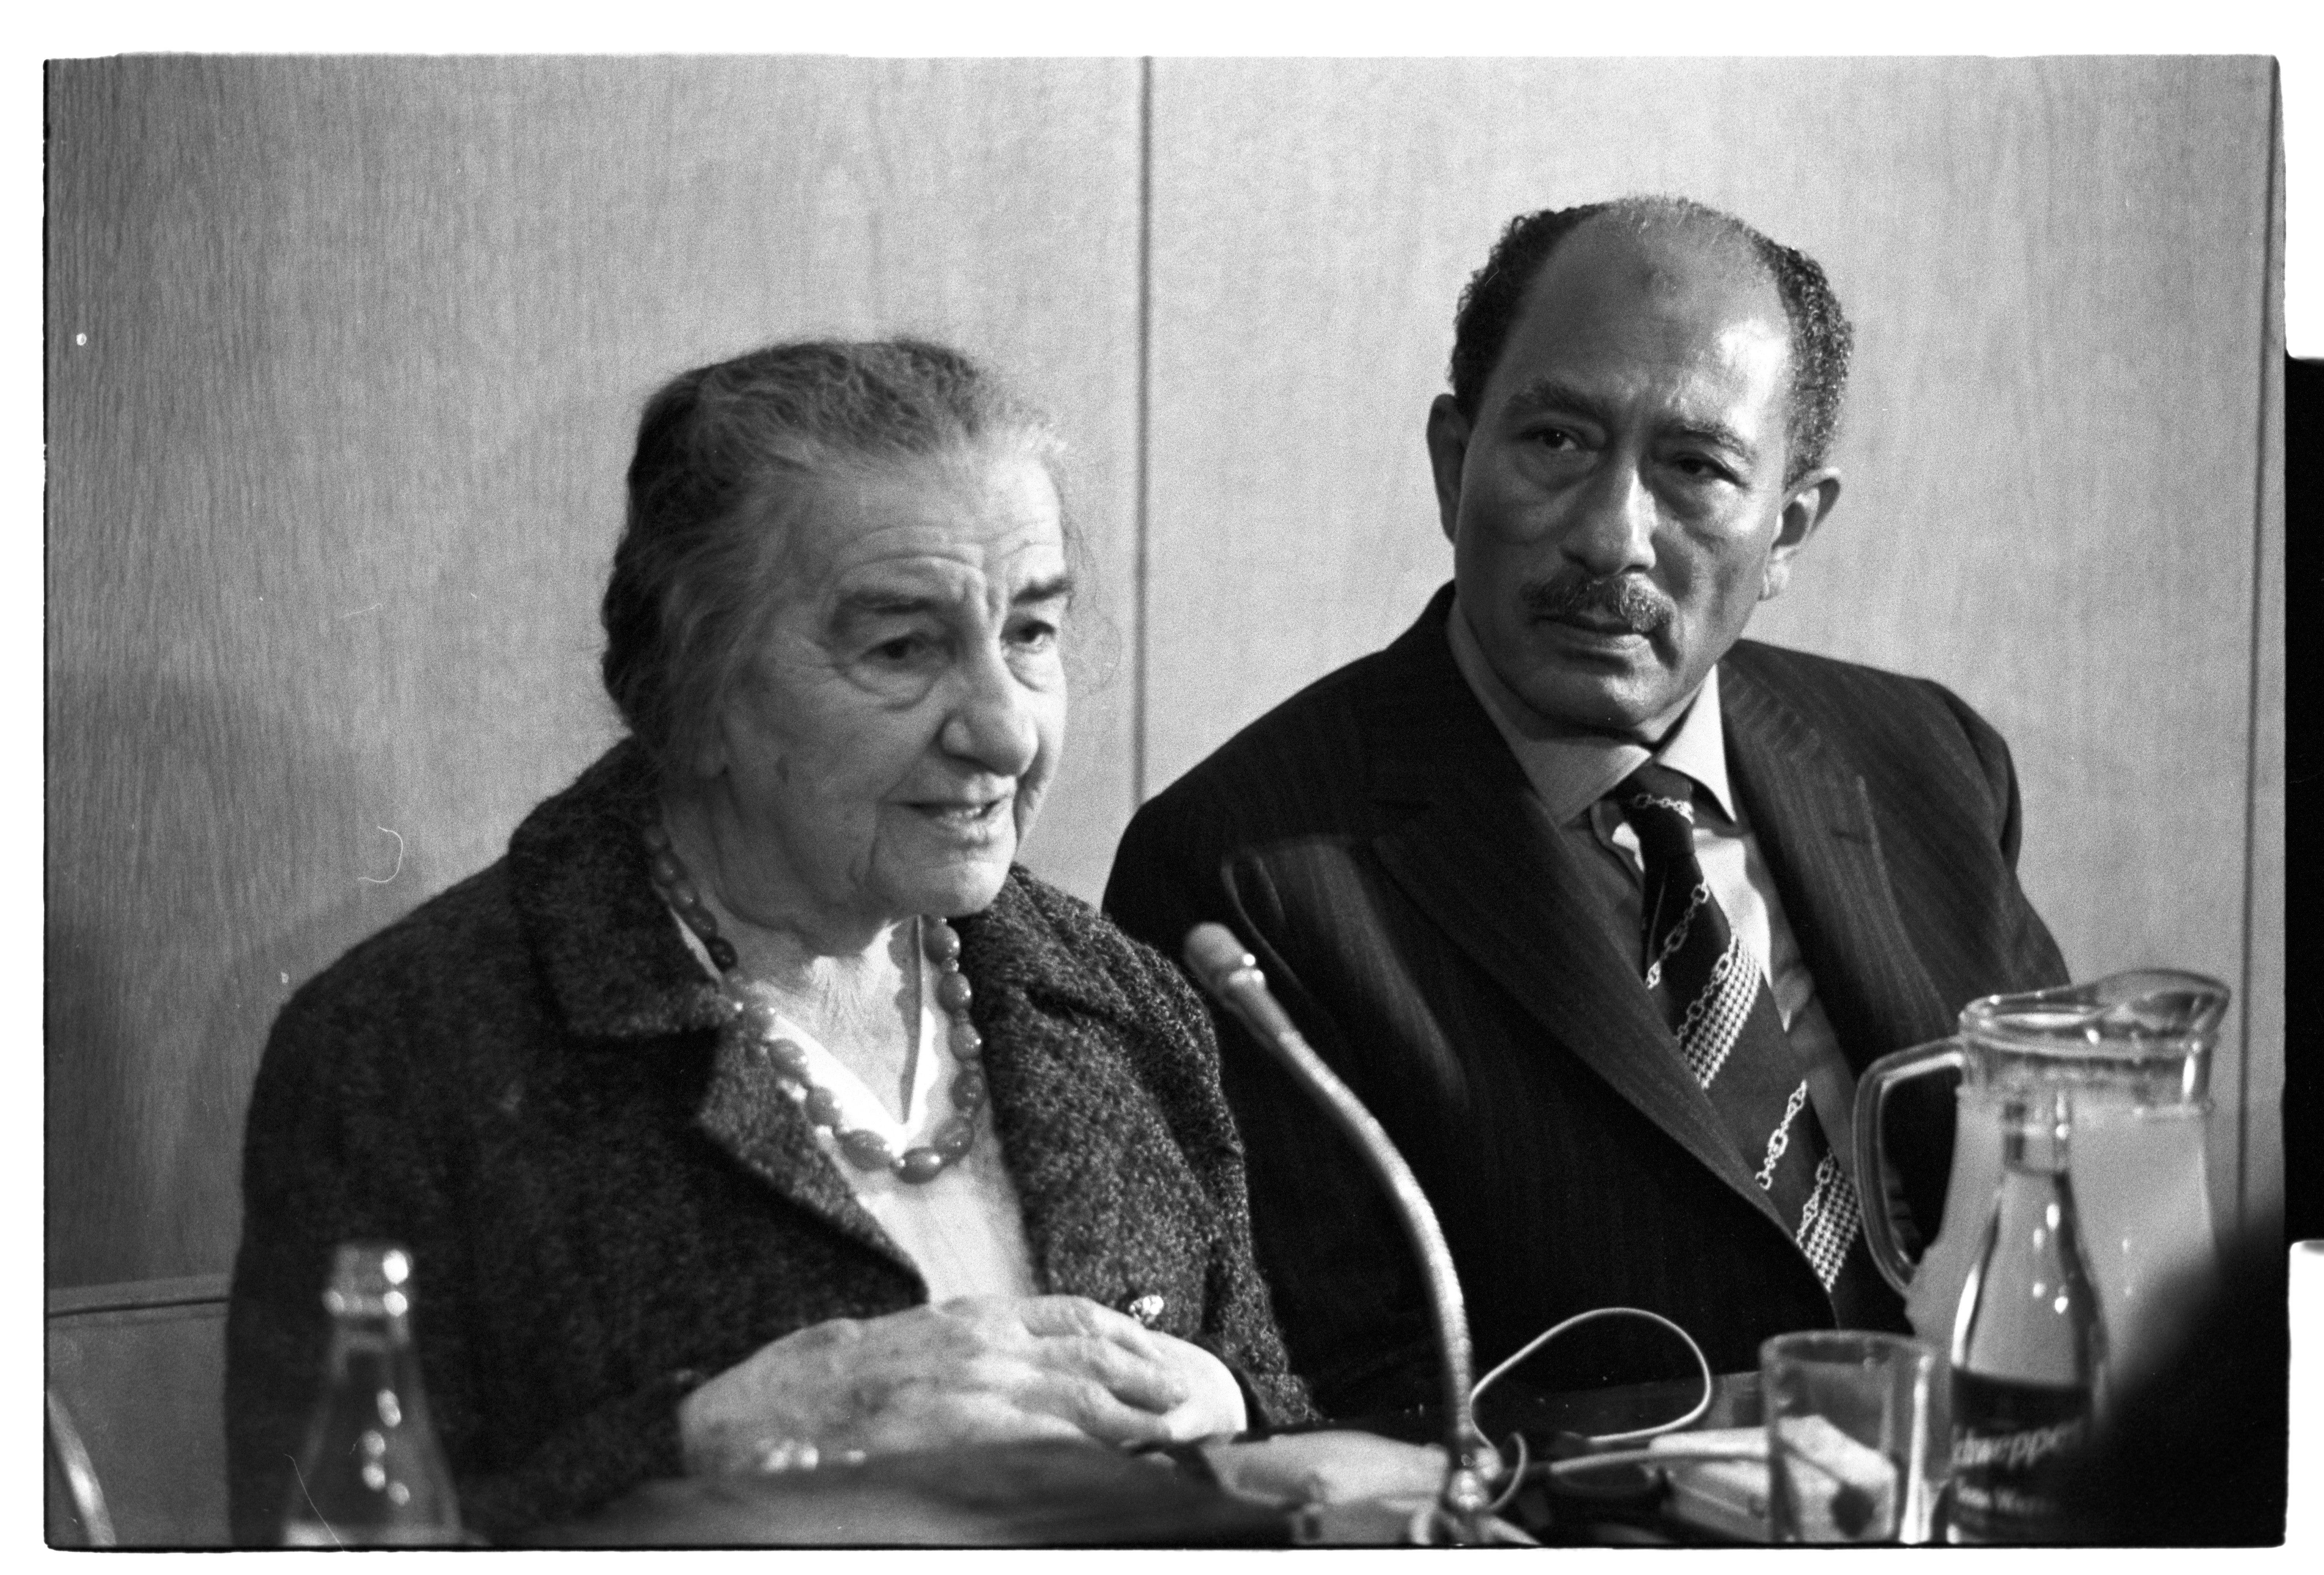 Голда и Анвар Садат. Фото: Давид Рубингер